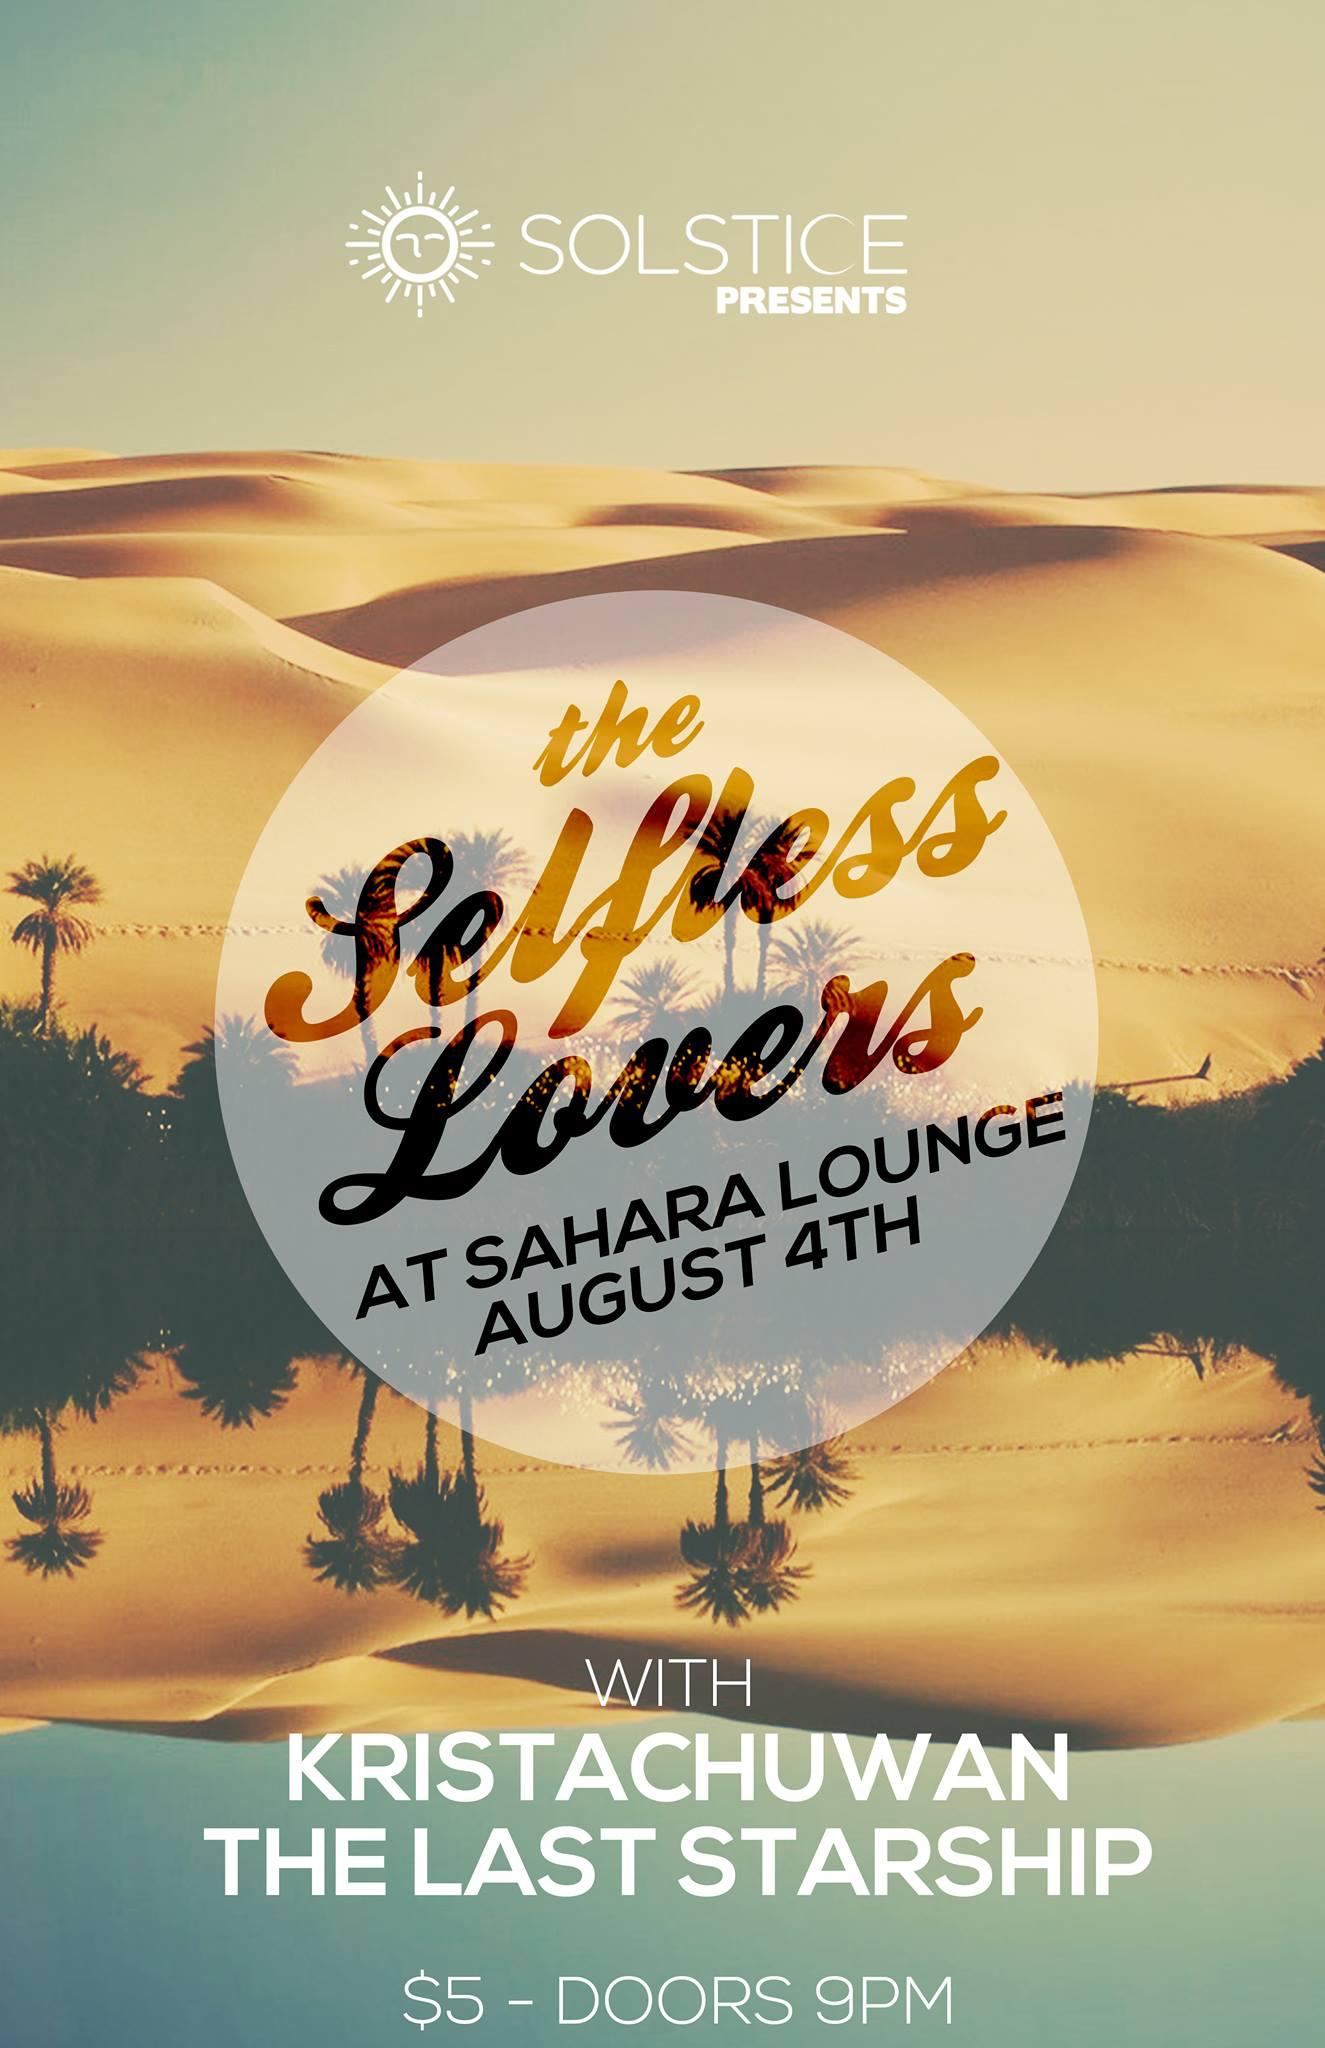 Sahara Lounge (8/4/16)